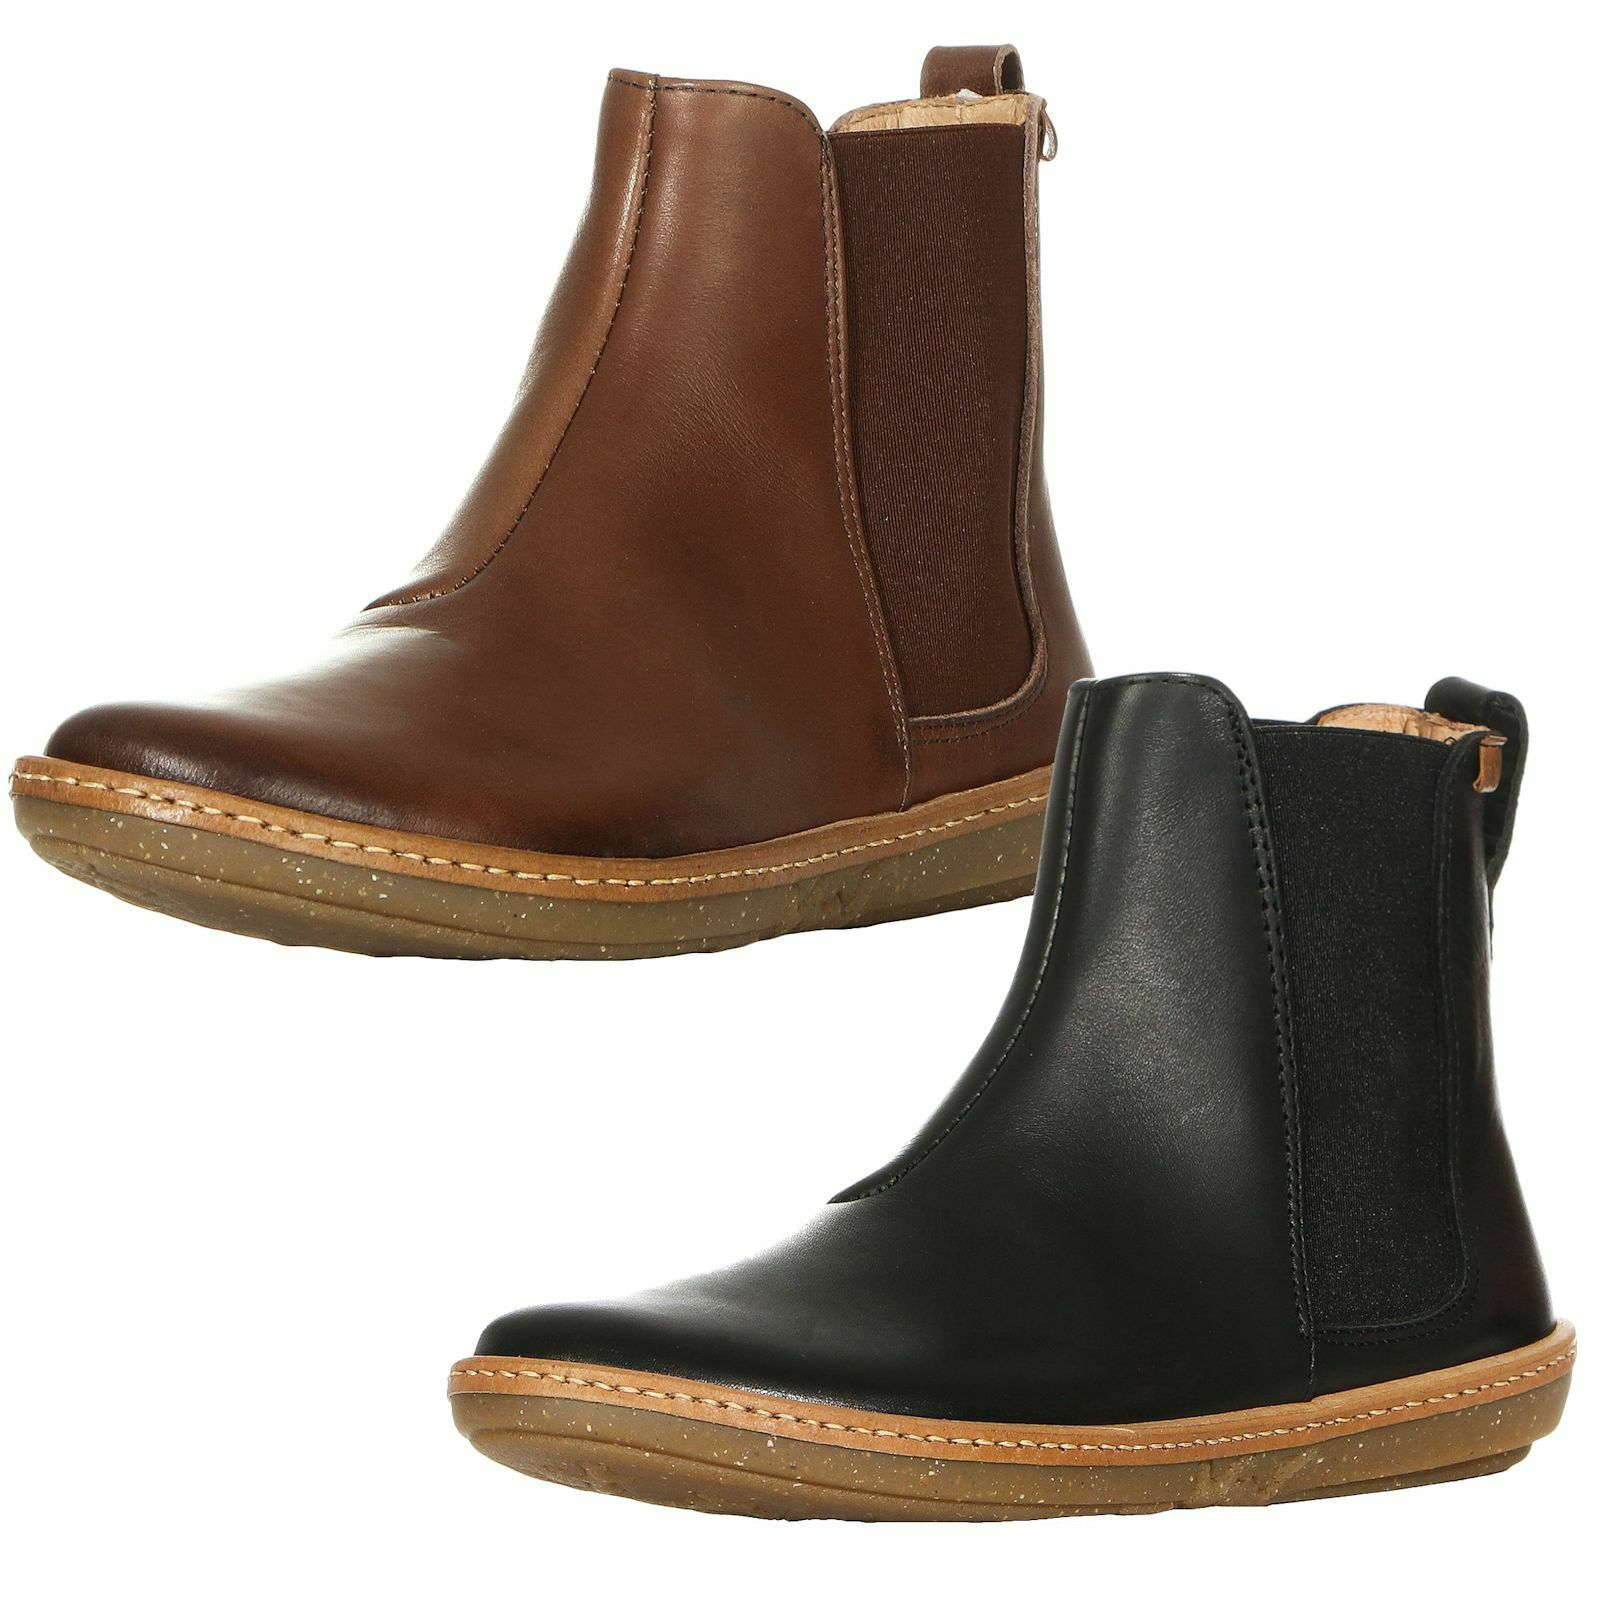 Damen Schuhe Chelsea Stiefel Stiefeletten Damenschuhe Stiefel El Naturalista 5310